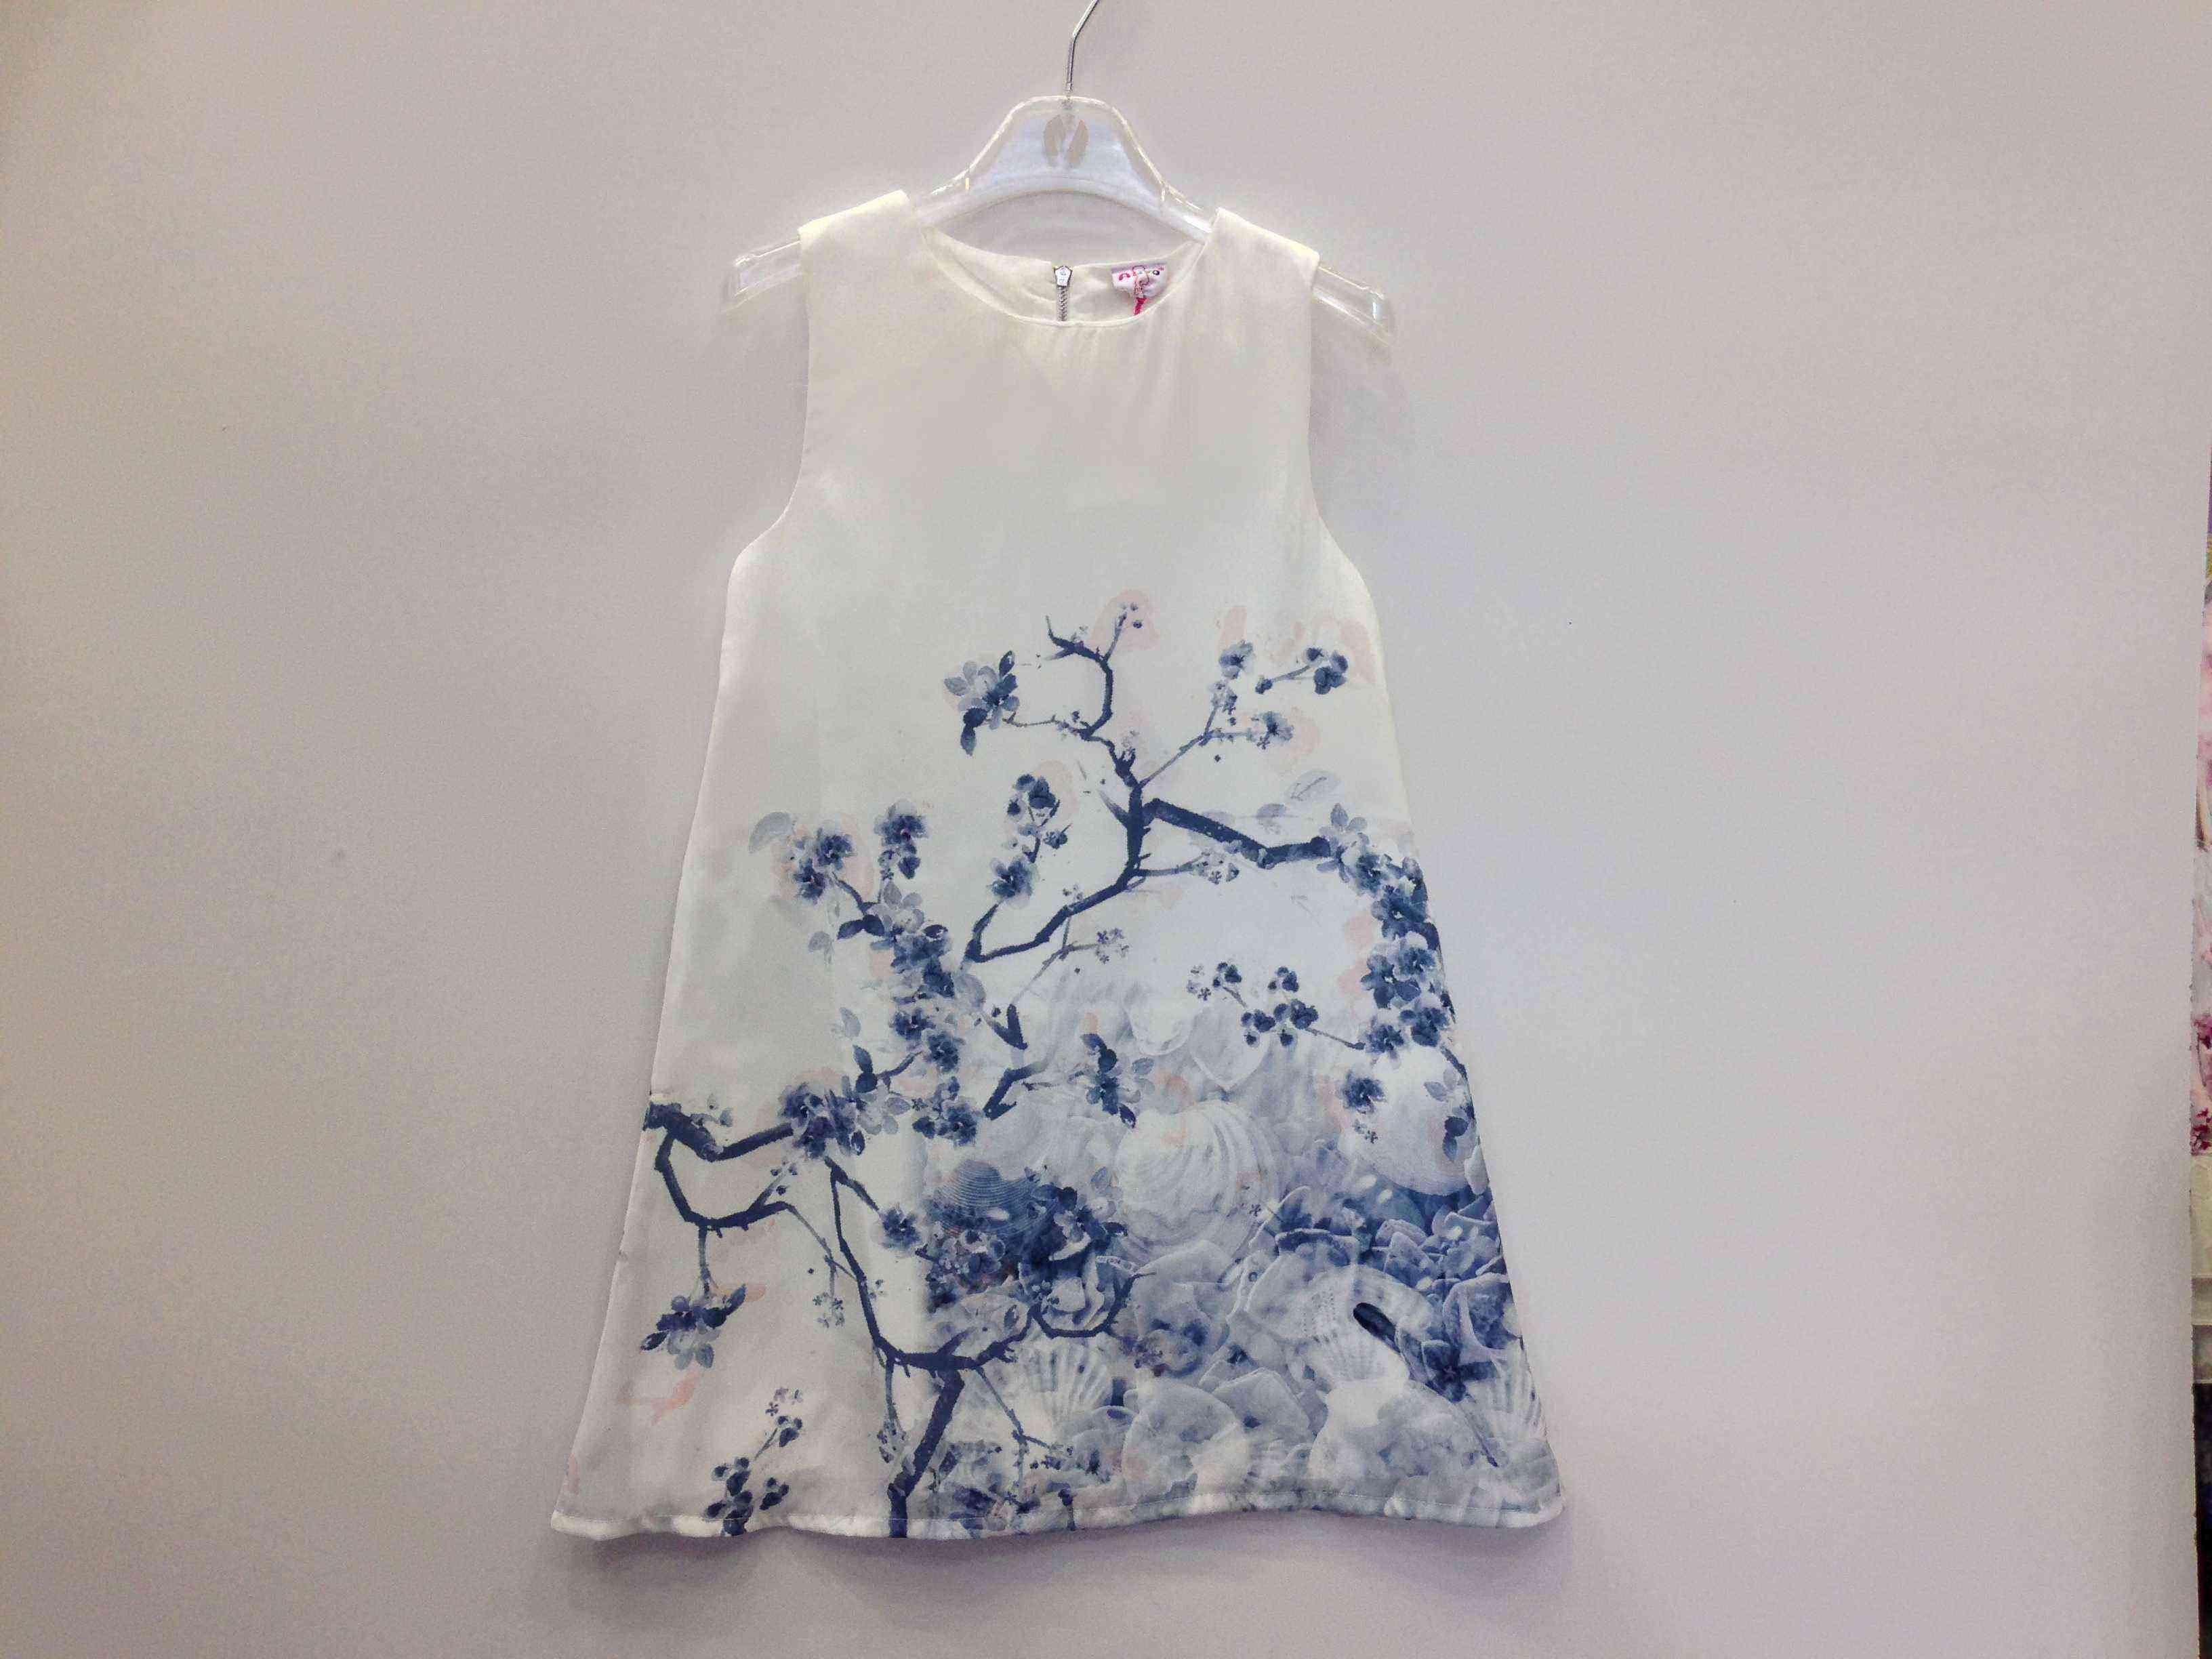 654c3553f3a φόρεμα λευκό-σιέλ